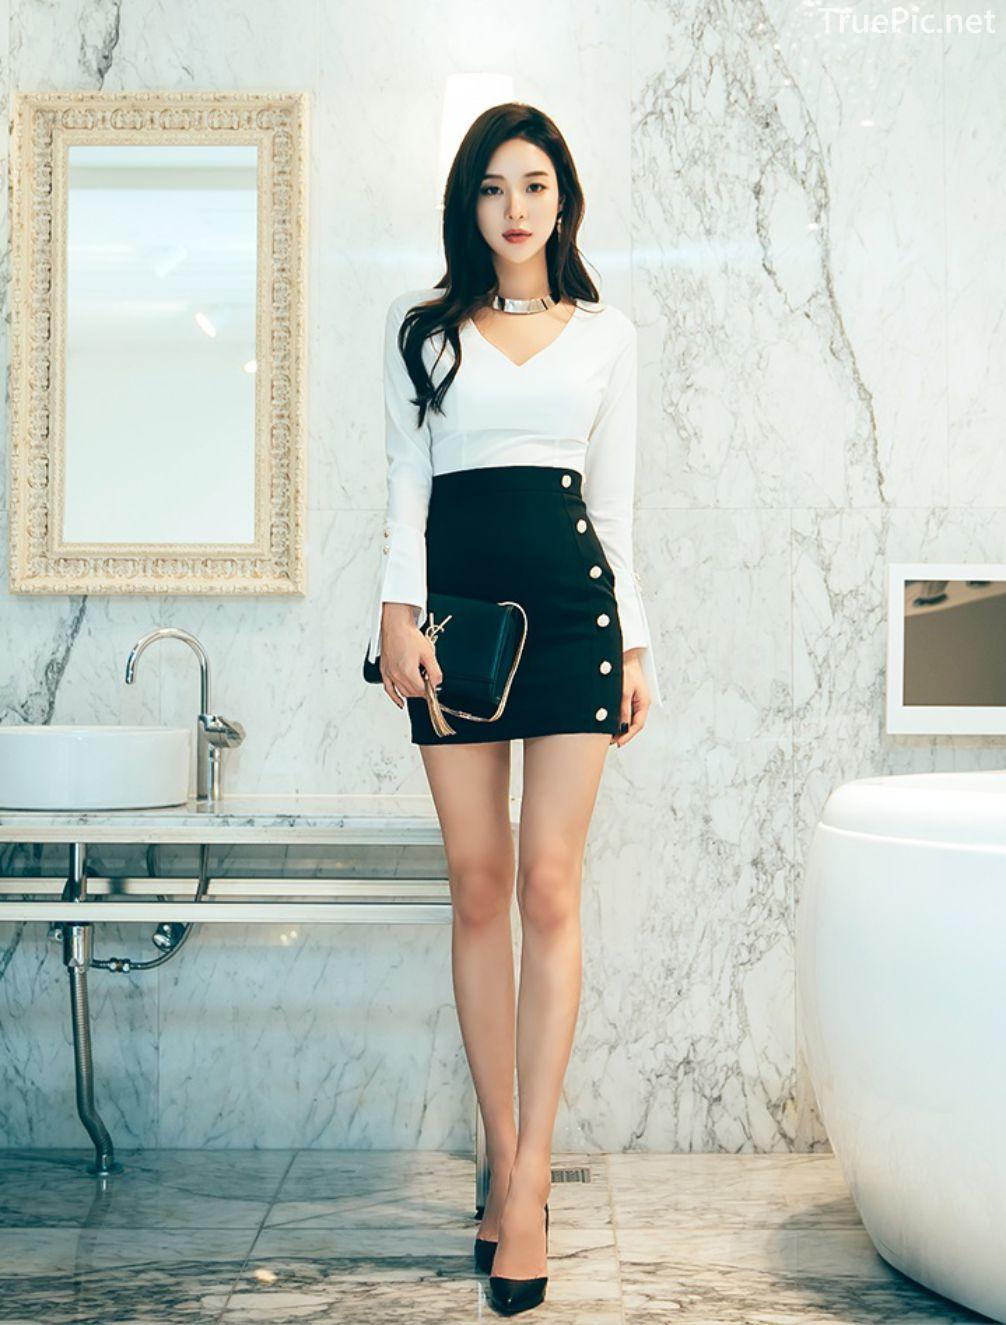 Korean Fashion Model - Park Da Hyun - Indoor Photoshoot Collection - TruePic.net - Picture 6